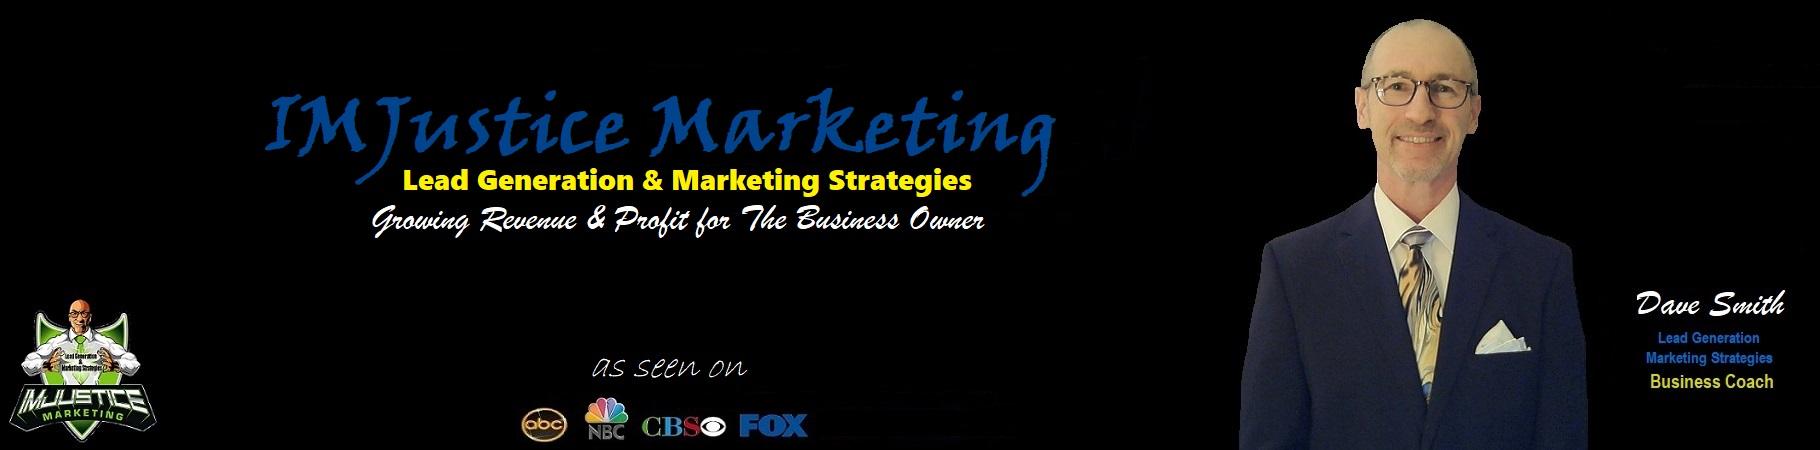 IMJustice Marketing